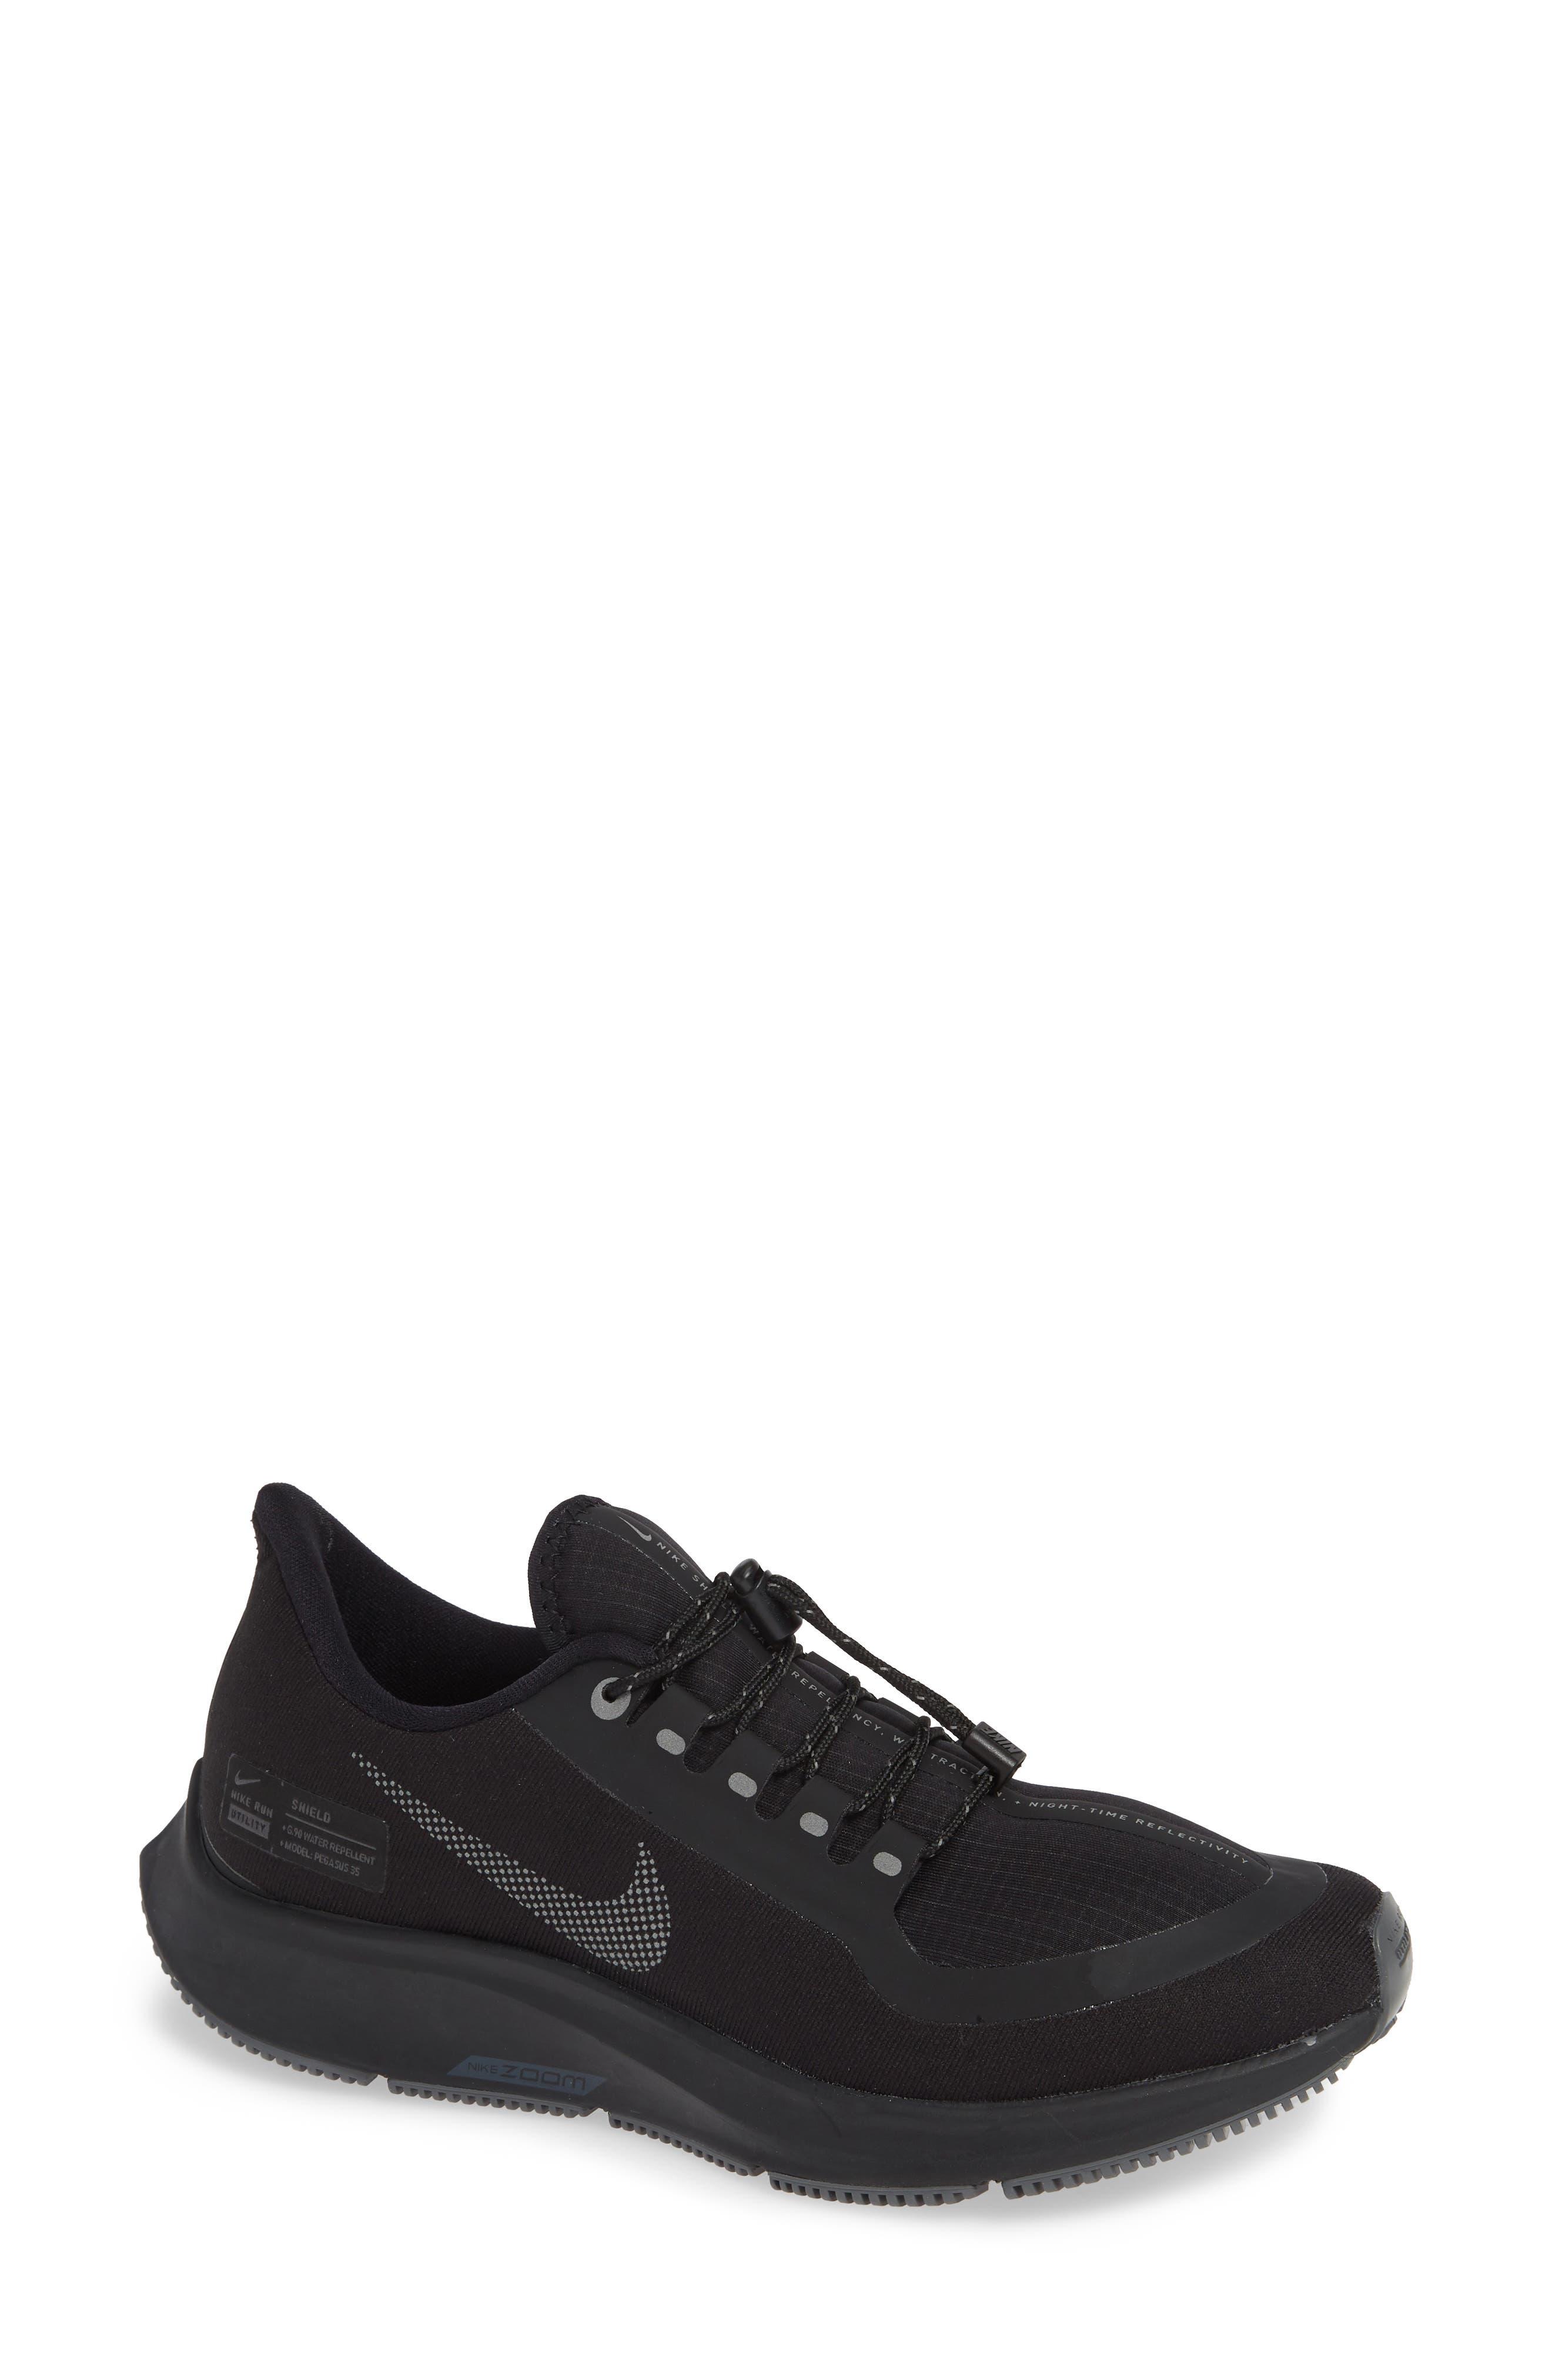 Air Zoom Pegasus 35 Shield Gs Water Repellent Running Shoe in Black/ Anthracite-Dark Grey